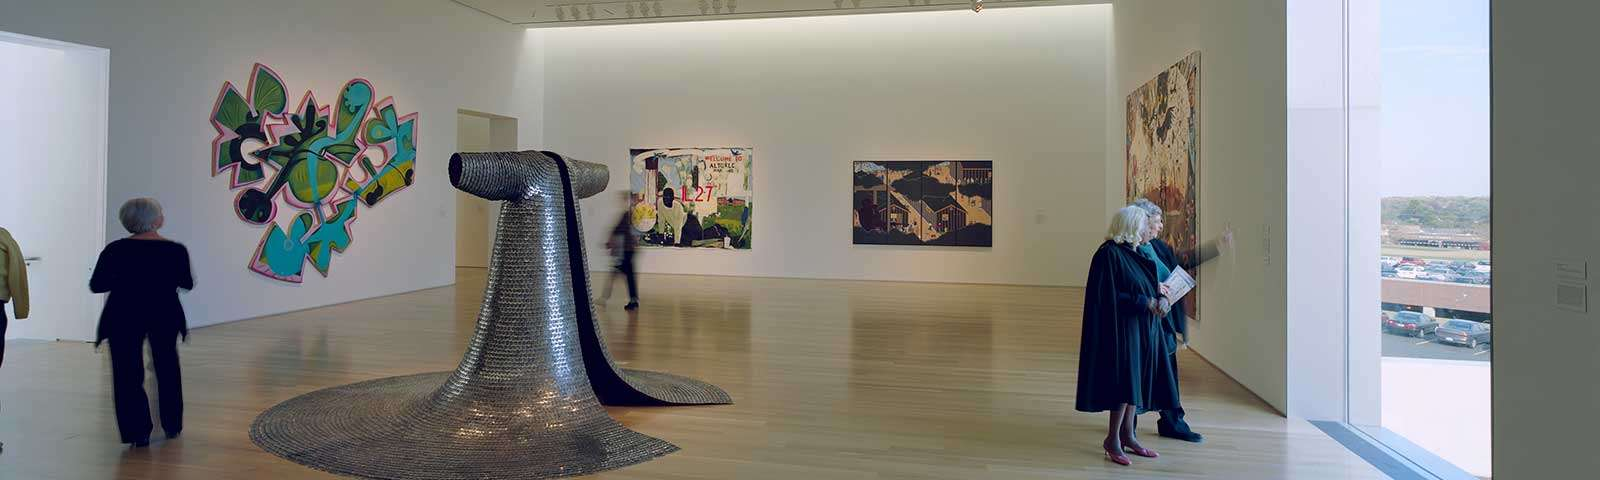 Nerman-Museum-of-Contemporary-Art-Overland-Park-Art-Itinerary